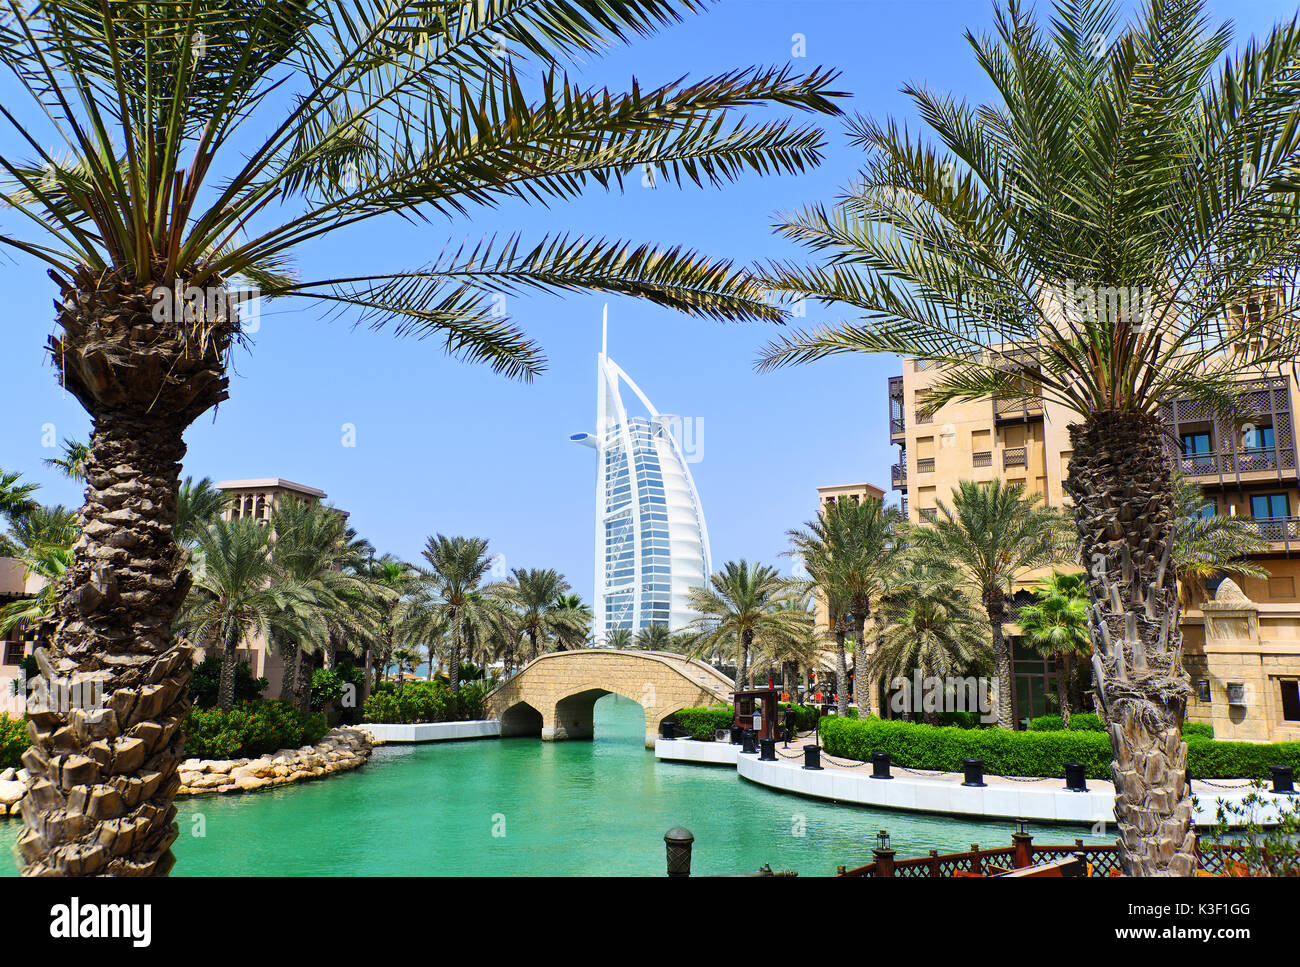 Madinat Jumeirah and the Burj al Arab Hotel in Dubai - Stock Image